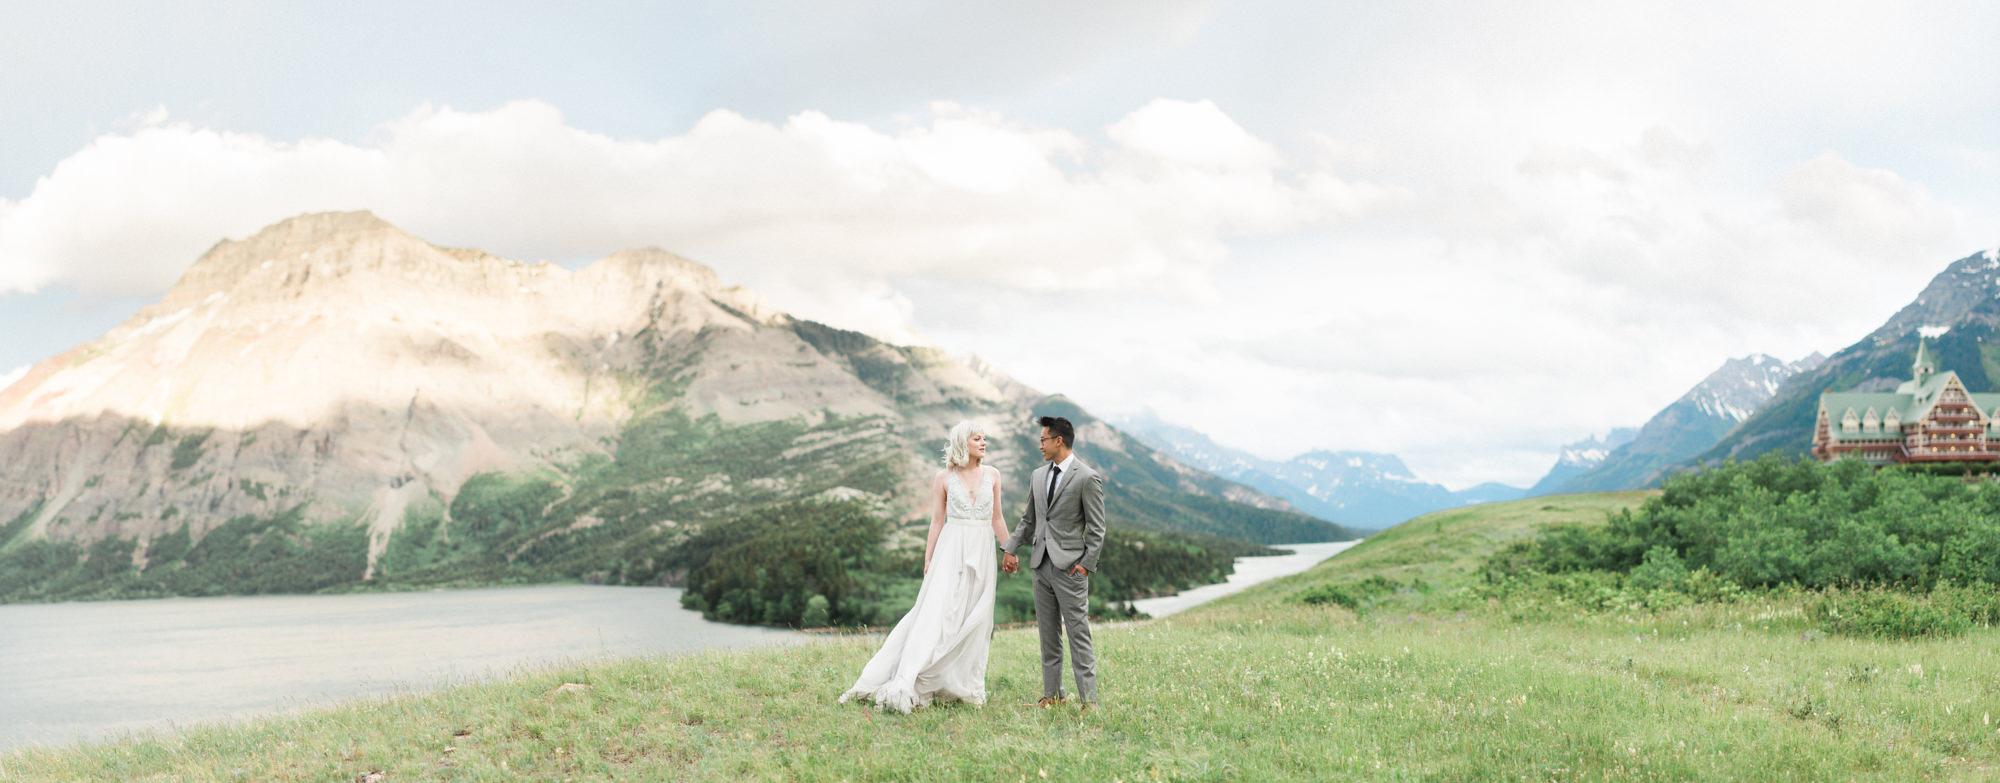 Waterton-wedding-1.jpg